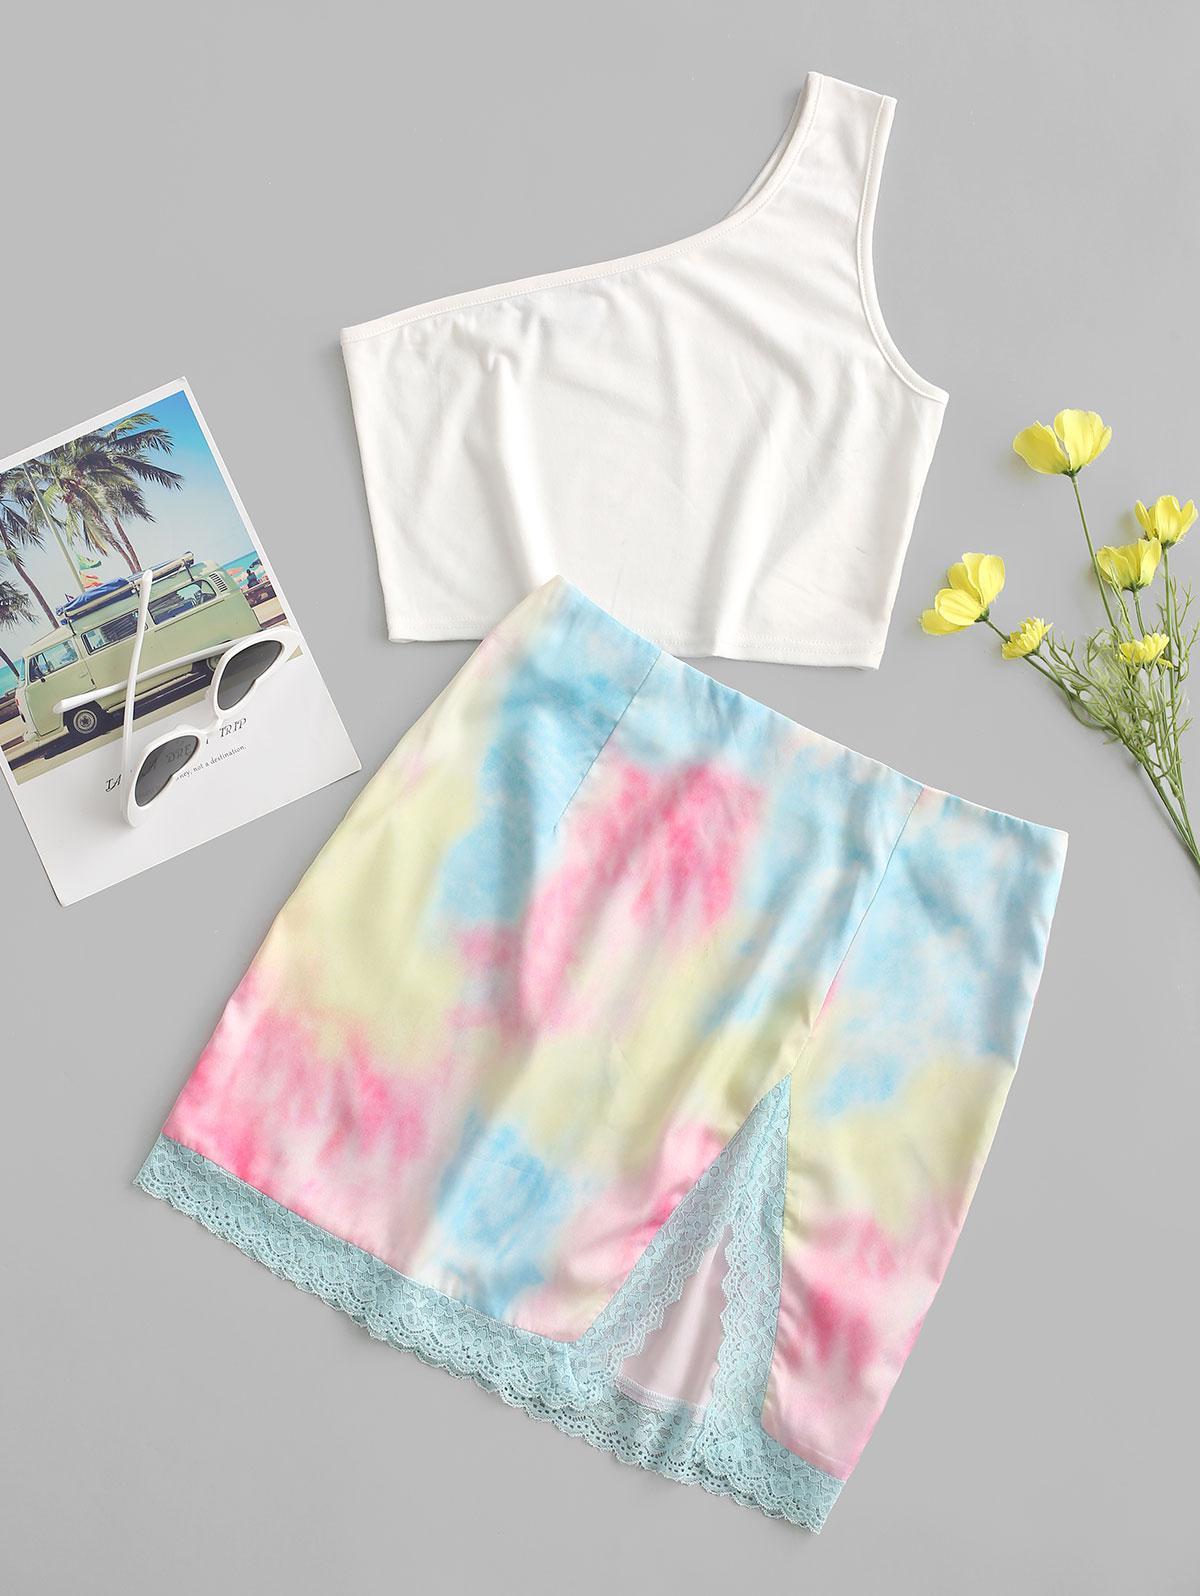 ZAFUL One Shoulder Lace Panel Tie Dye Two Piece Dress